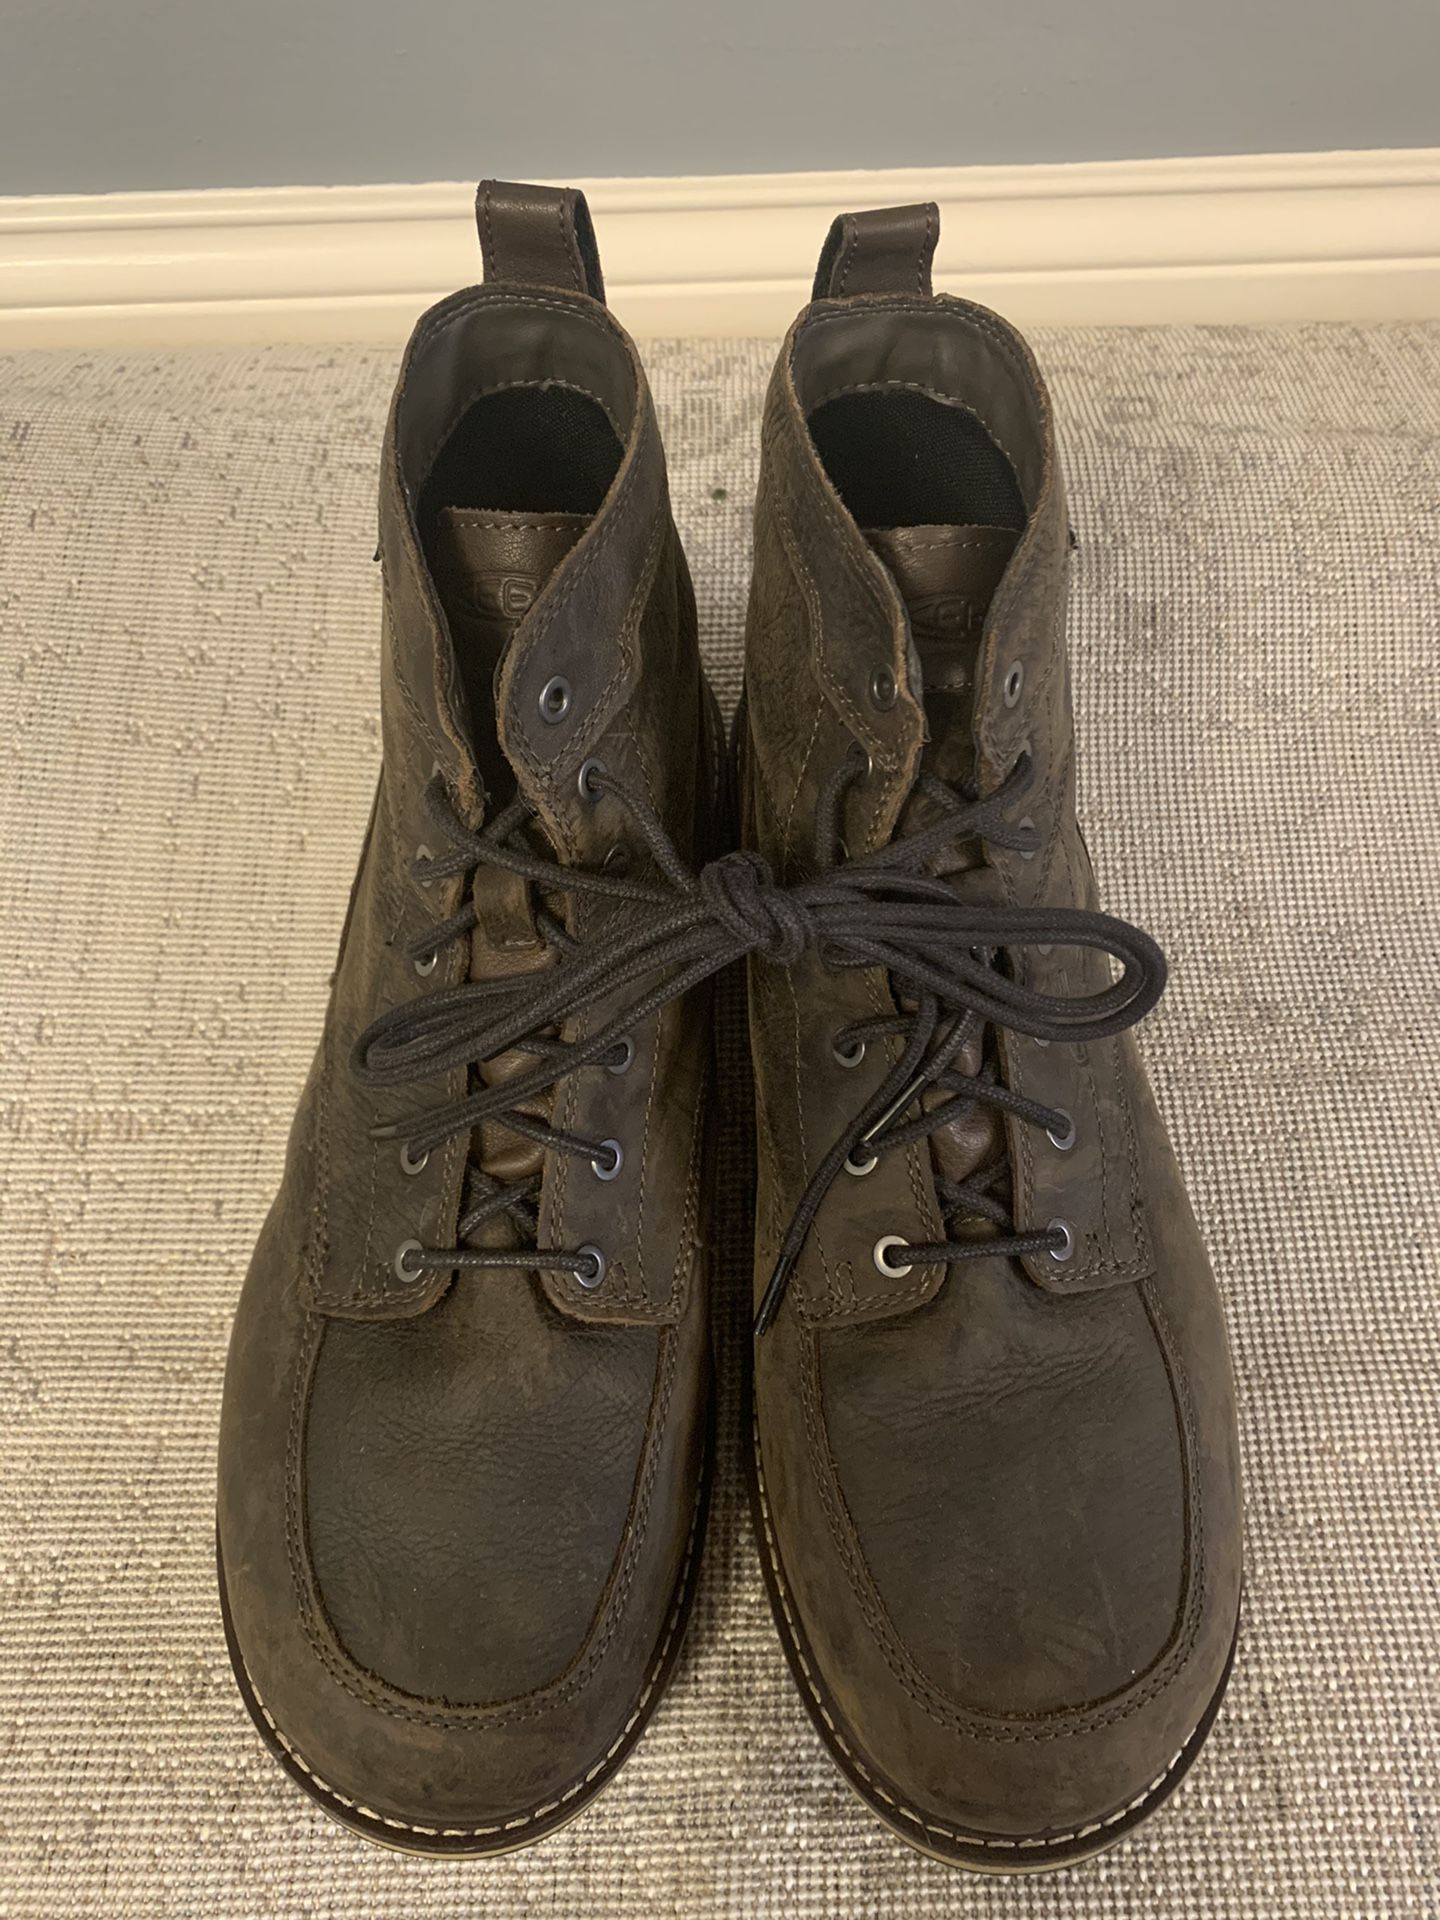 KEEN Utility San Jose Waterproof Aluminum Toe Work Boots For Men - Cascade Brown/Black - 14M